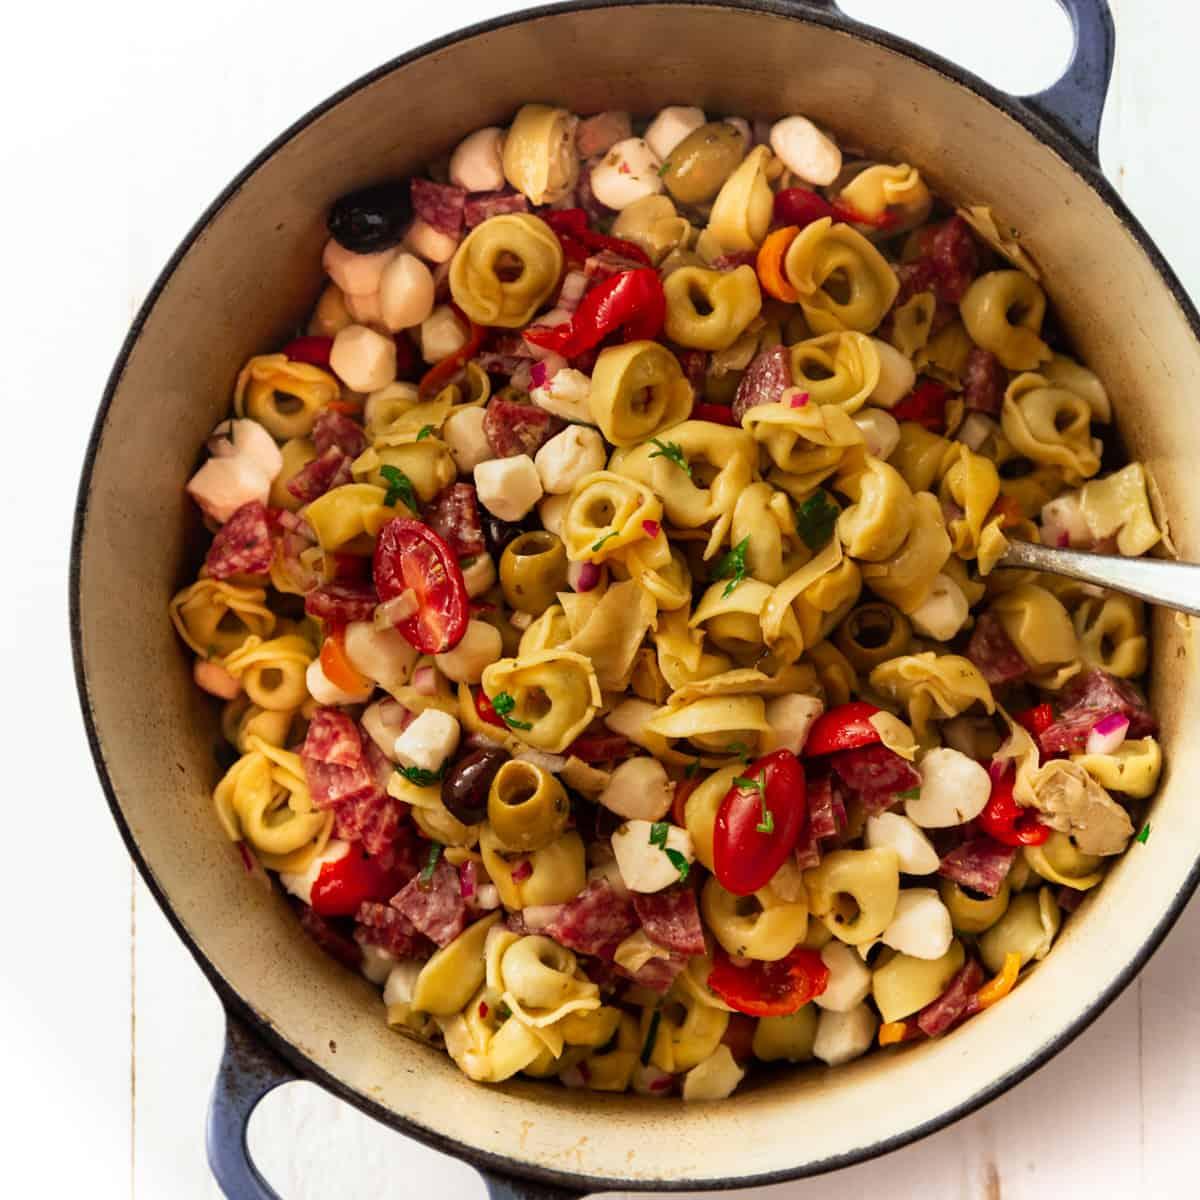 pasta salad in a blue dutch oven